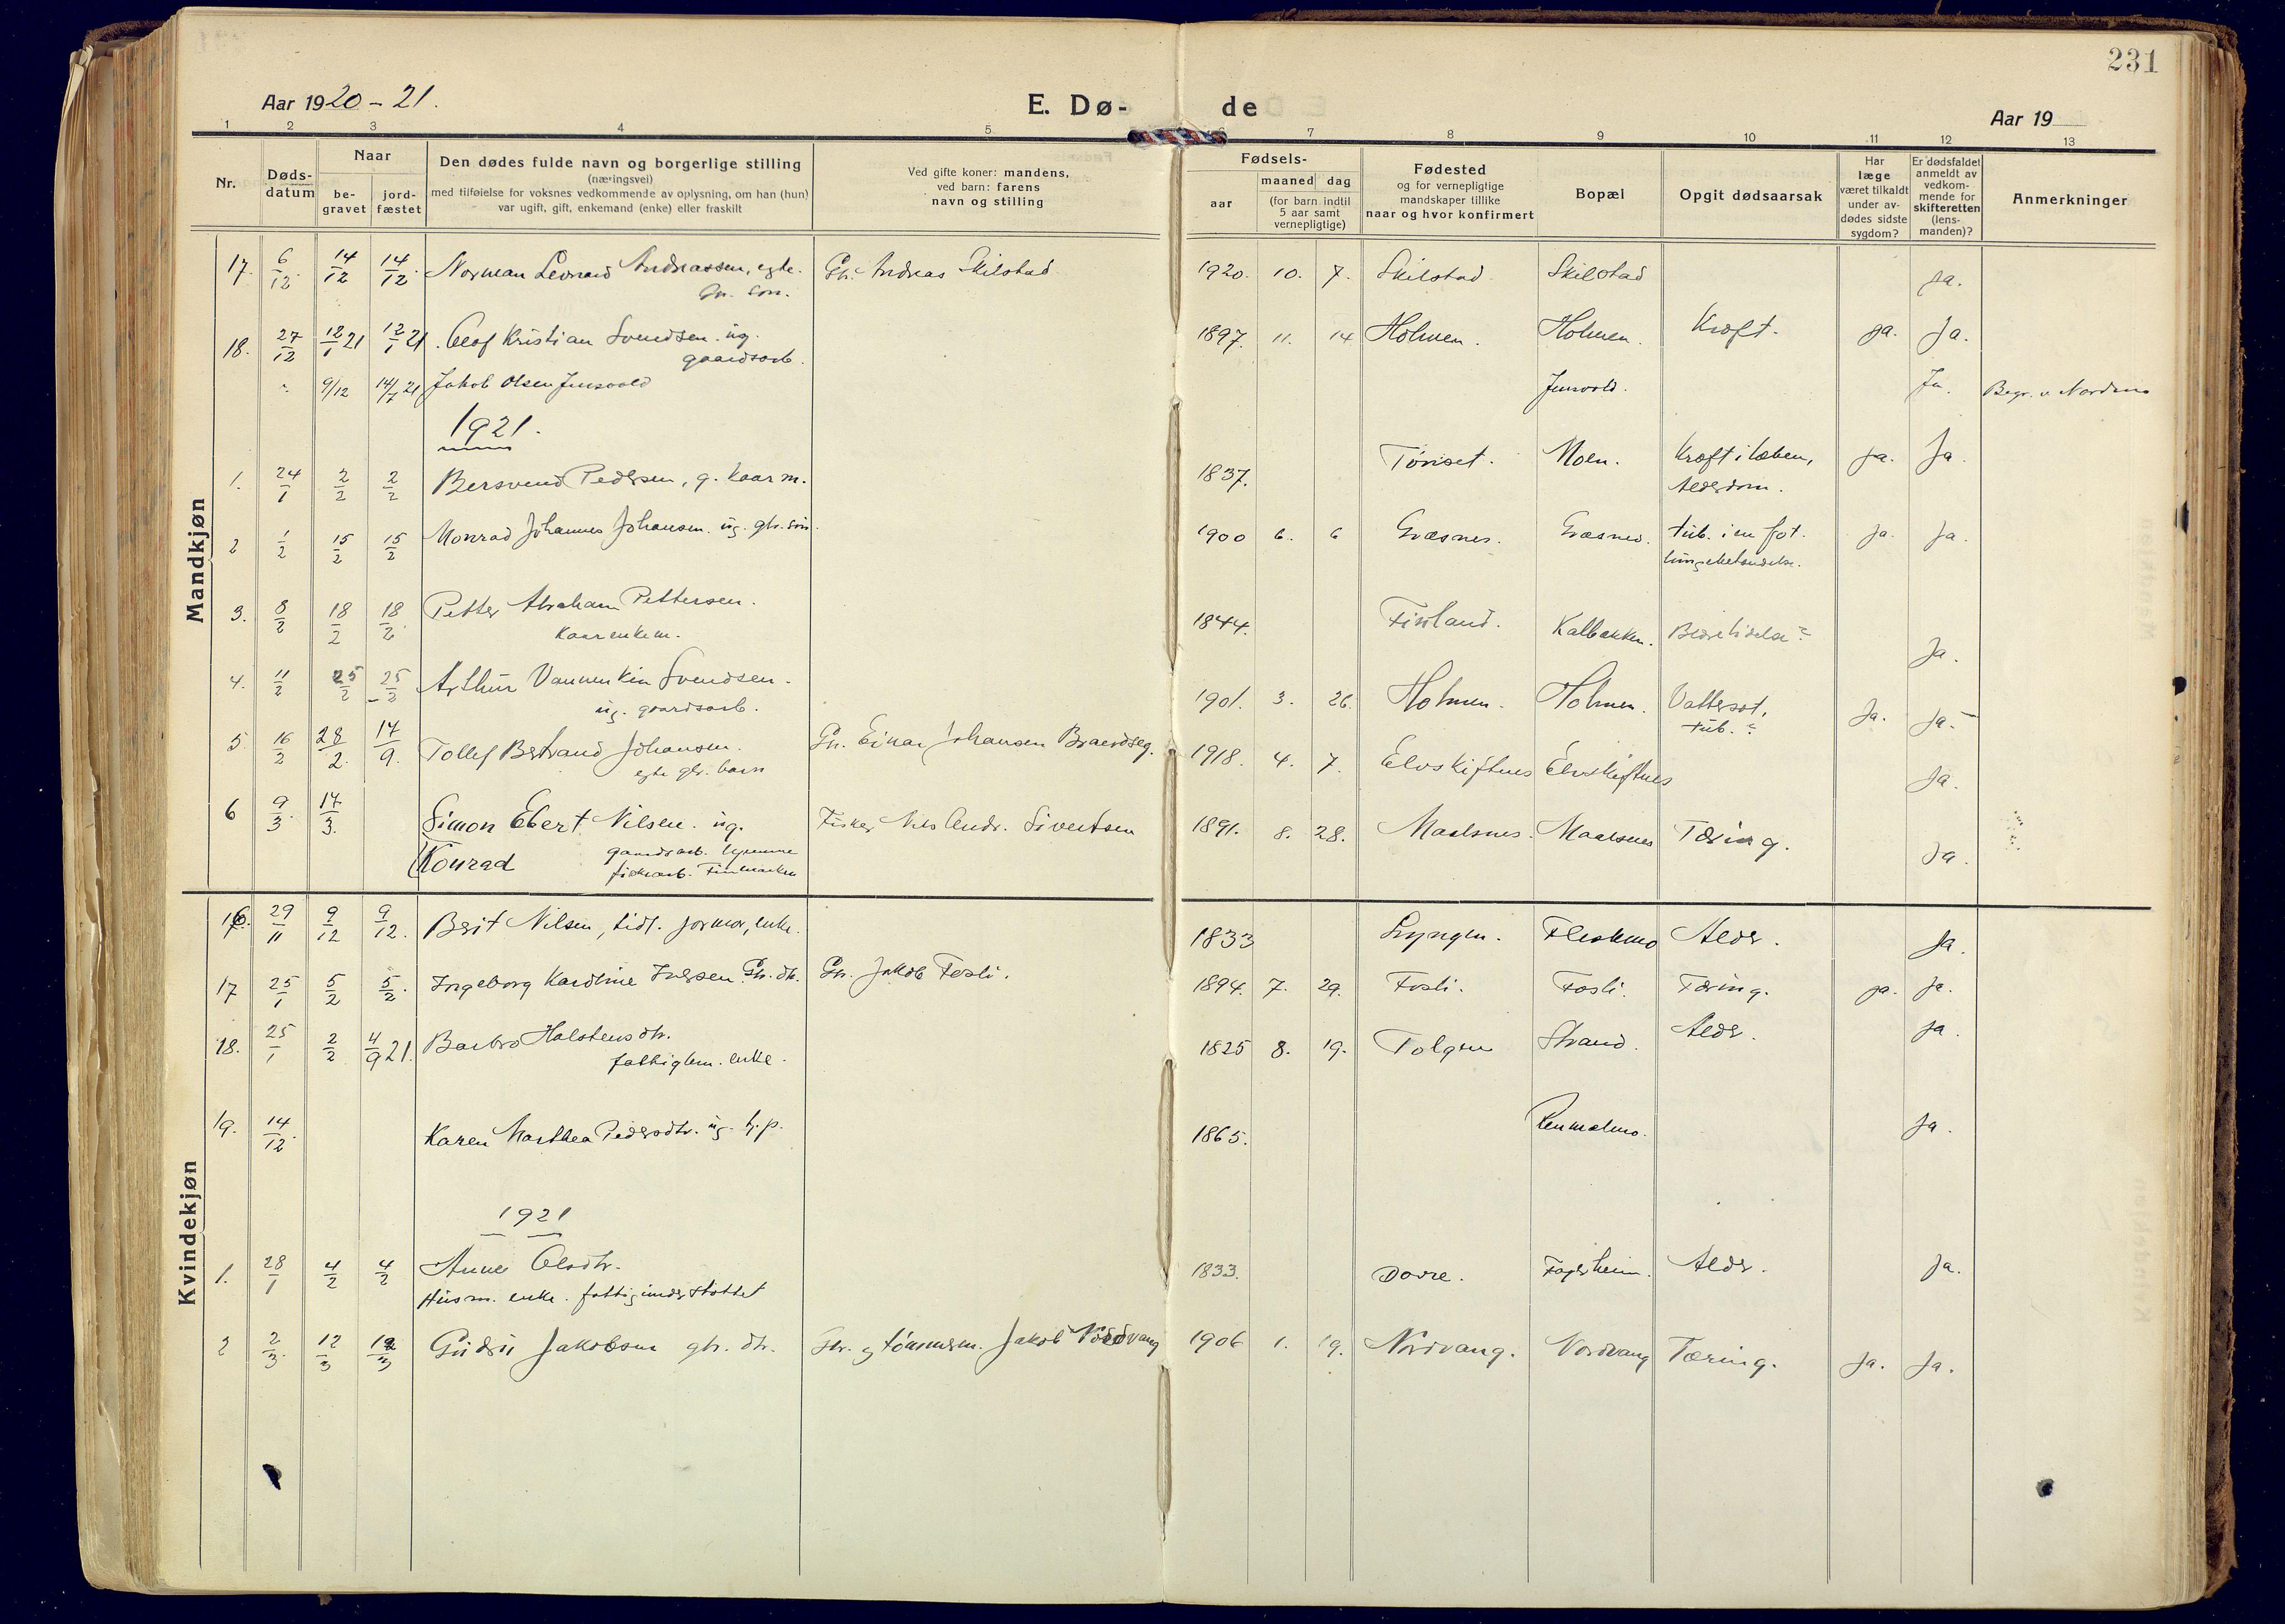 SATØ, Målselv sokneprestembete, Ministerialbok nr. 14, 1919-1932, s. 231